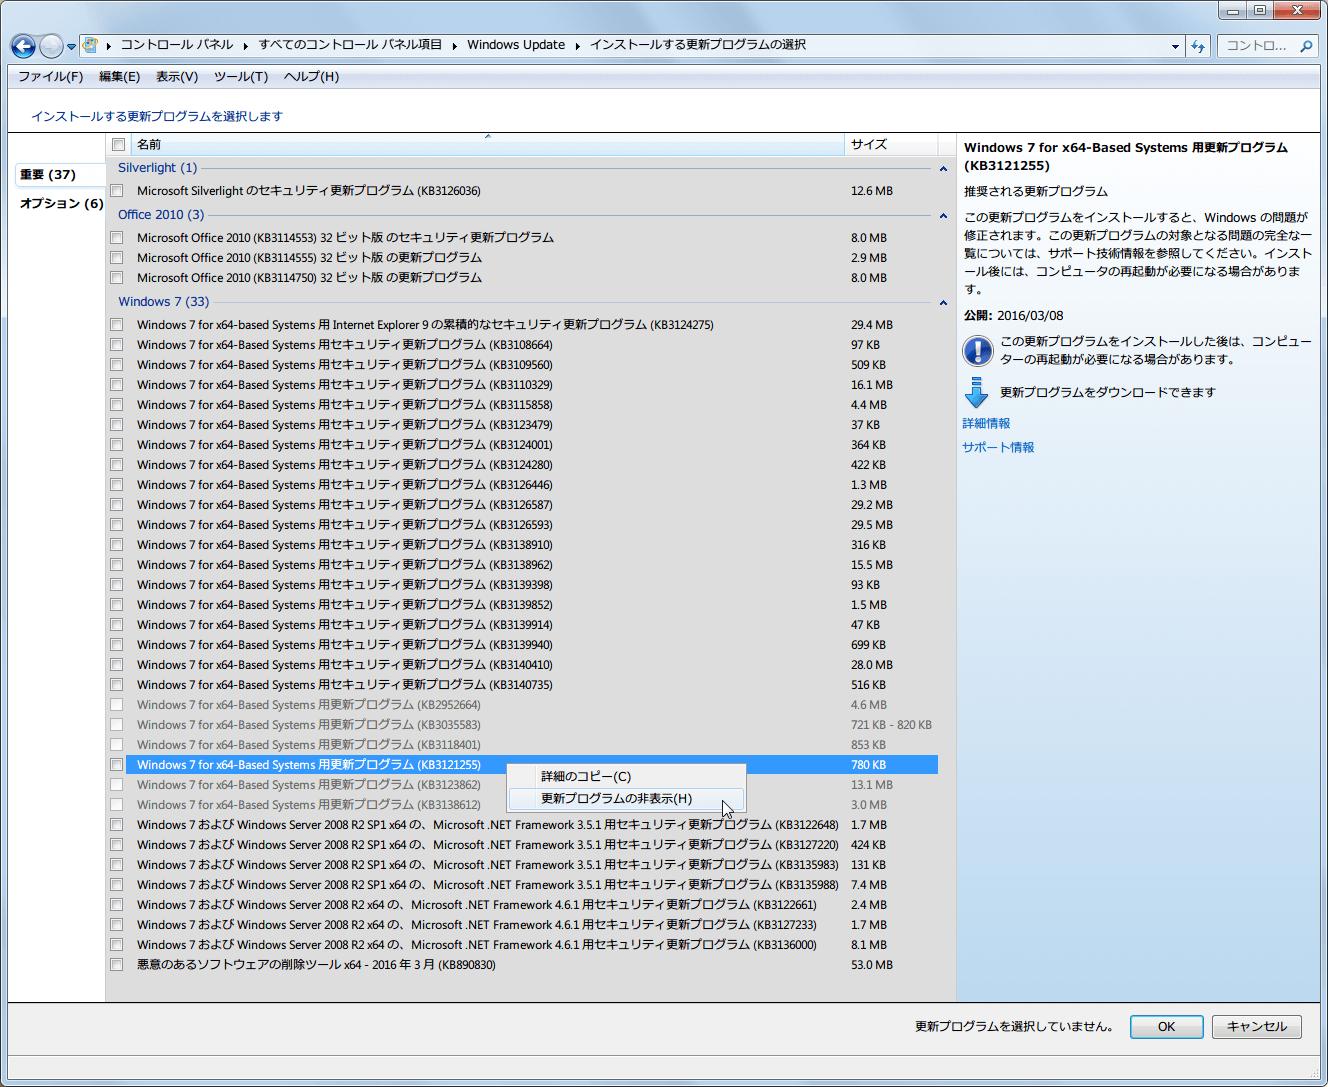 Windows 7 64bit Windows Update 重要 2016年3月8日公開 KB3121255 更新プログラムの非表示